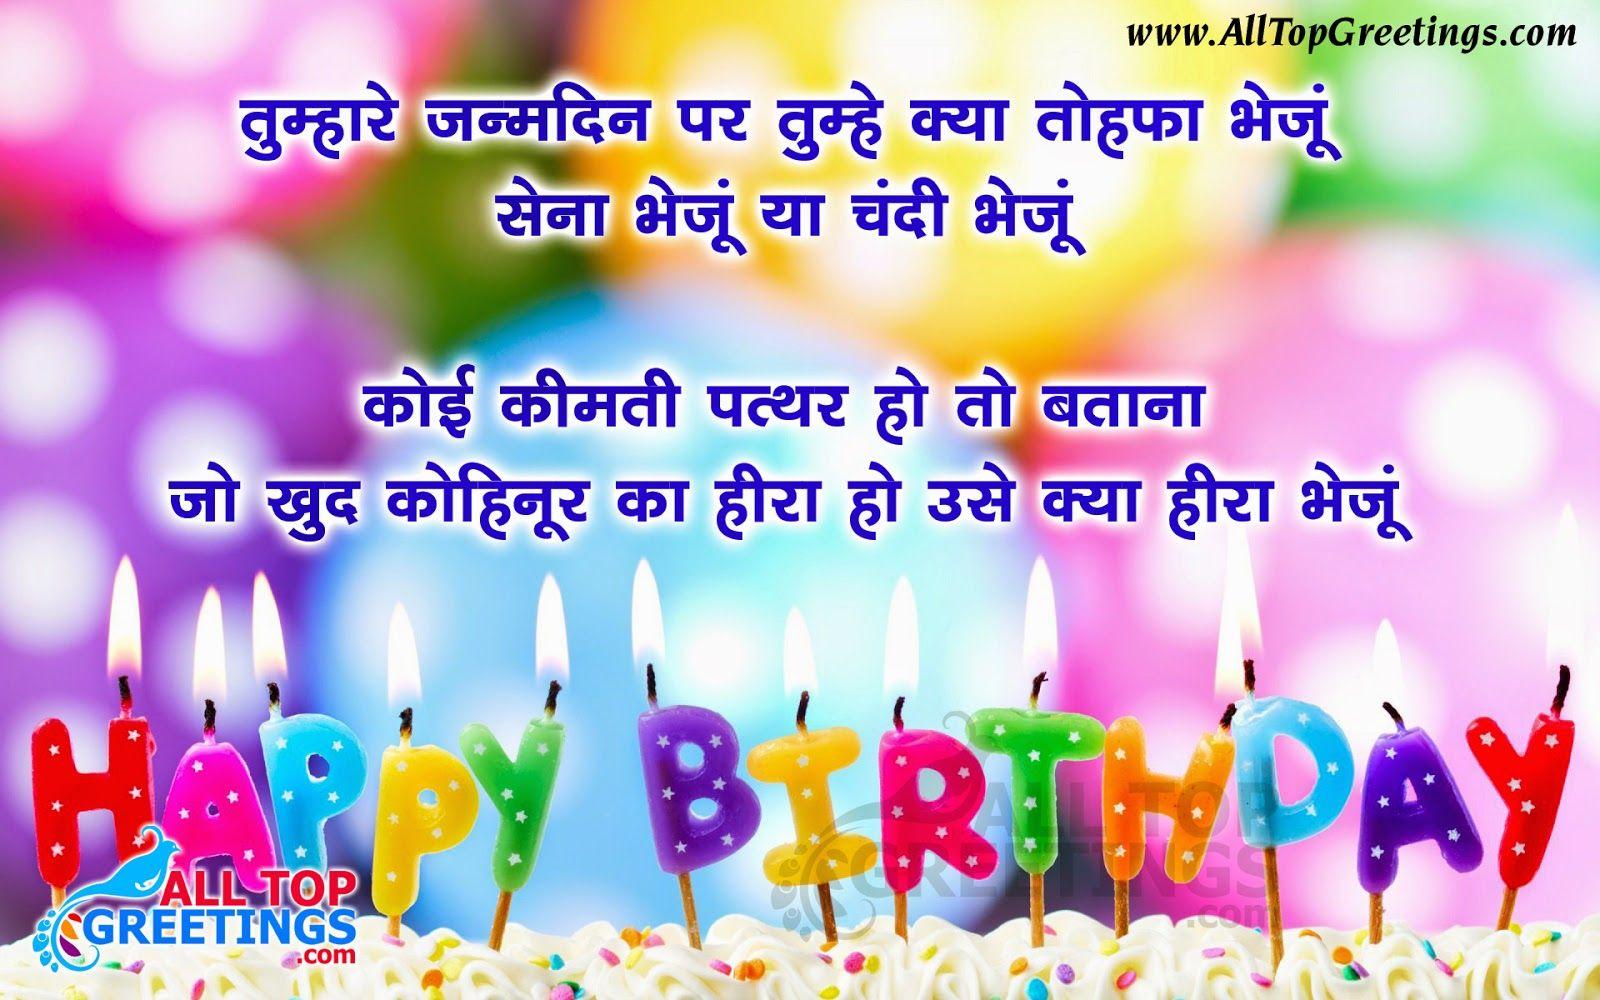 Birthday Sms Hindi Marathi English For Happy Wishes Birthday Message For Friend Birthday Wishes For Friend Wishes For Friends